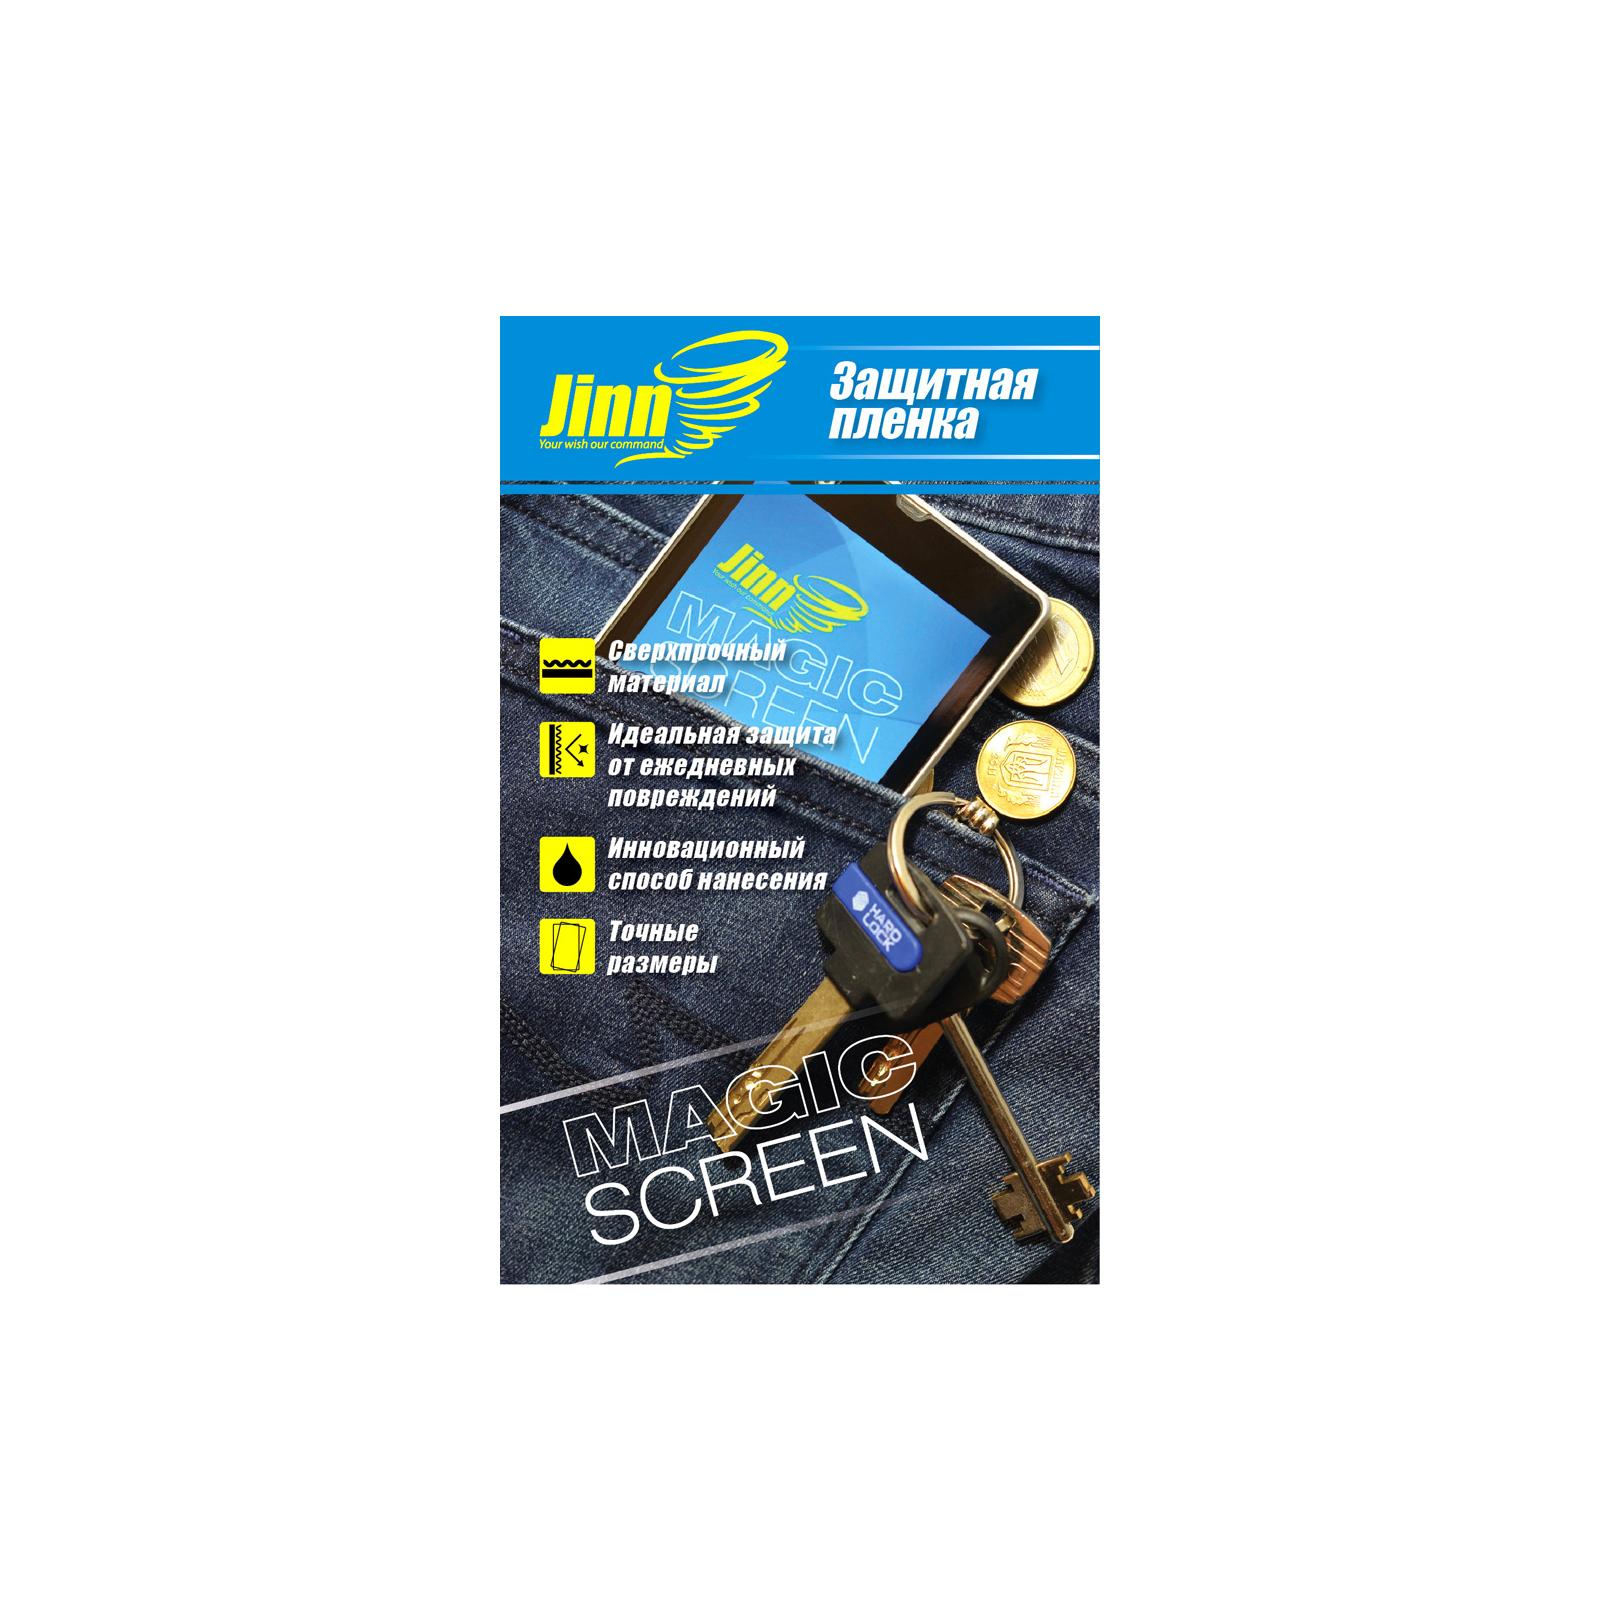 Пленка защитная JINN ультрапрочная Magic Screen для Fly IQ440 Energie (Fly IQ440 Energie front)